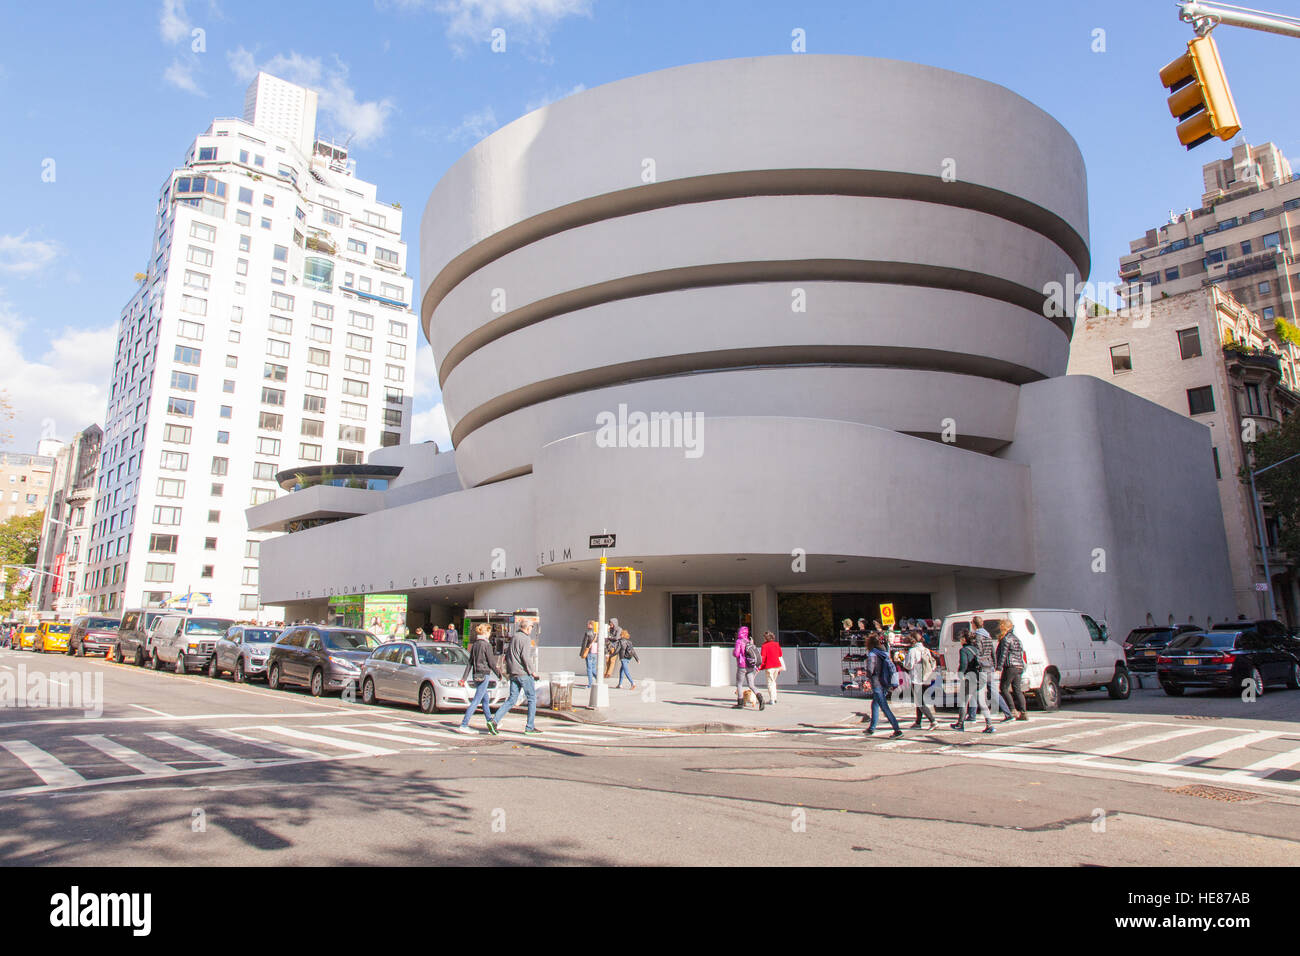 Guggenheim Museum Manhattan Stock Photos   Guggenheim Museum ... 499d86c3e4fe